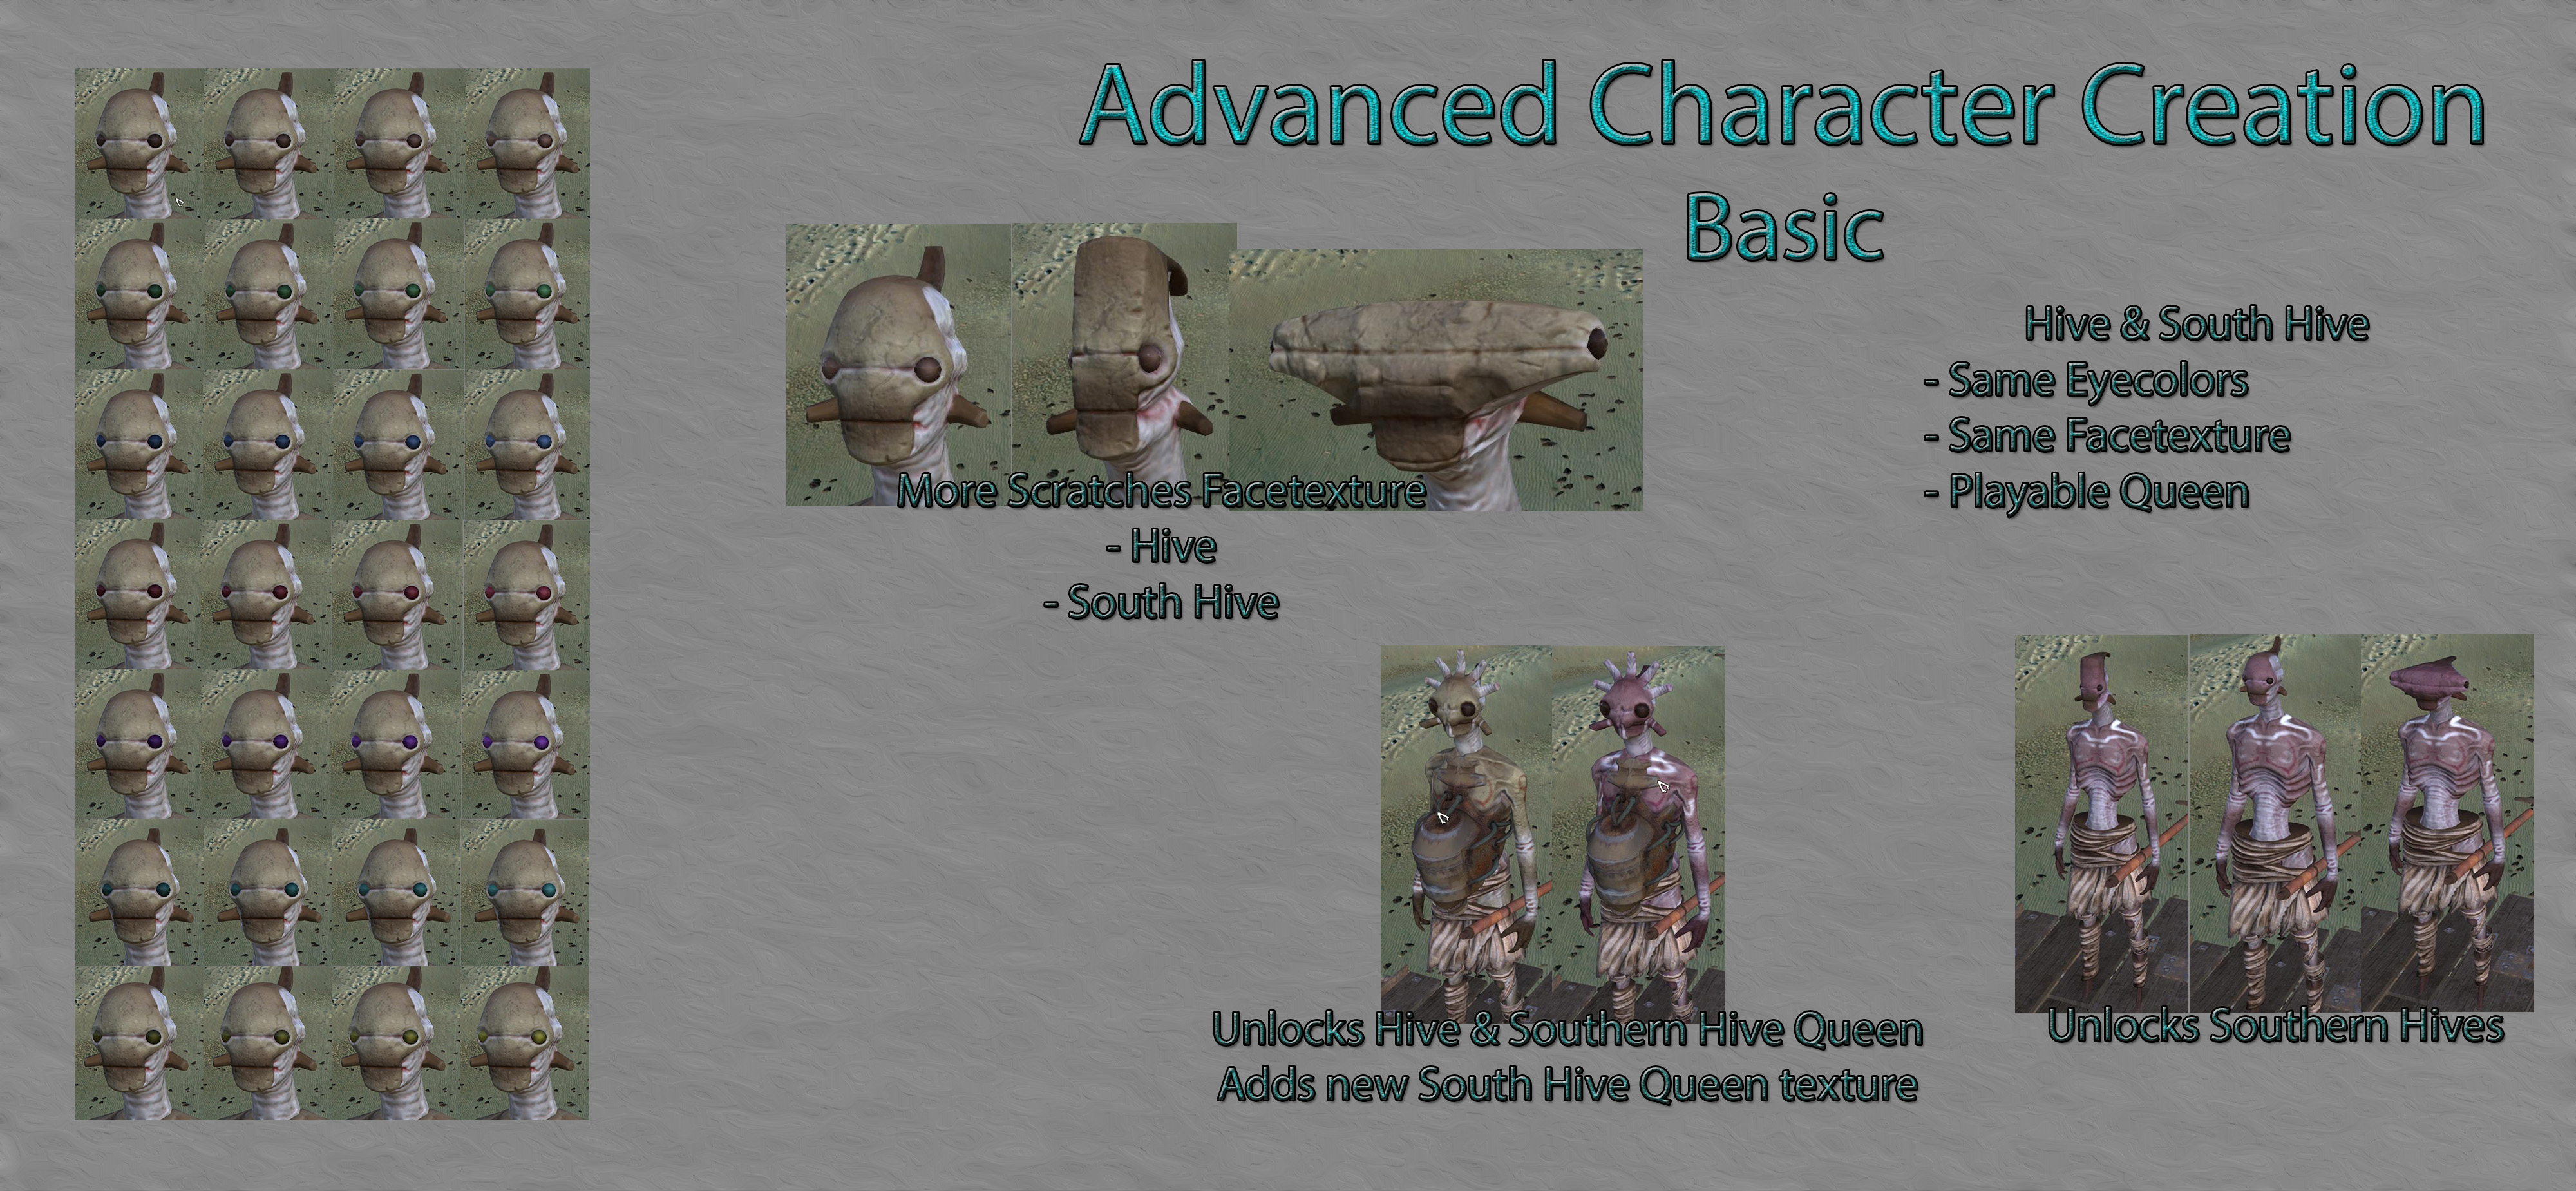 Advanced Character Creation / Расширенное создание персонажей!